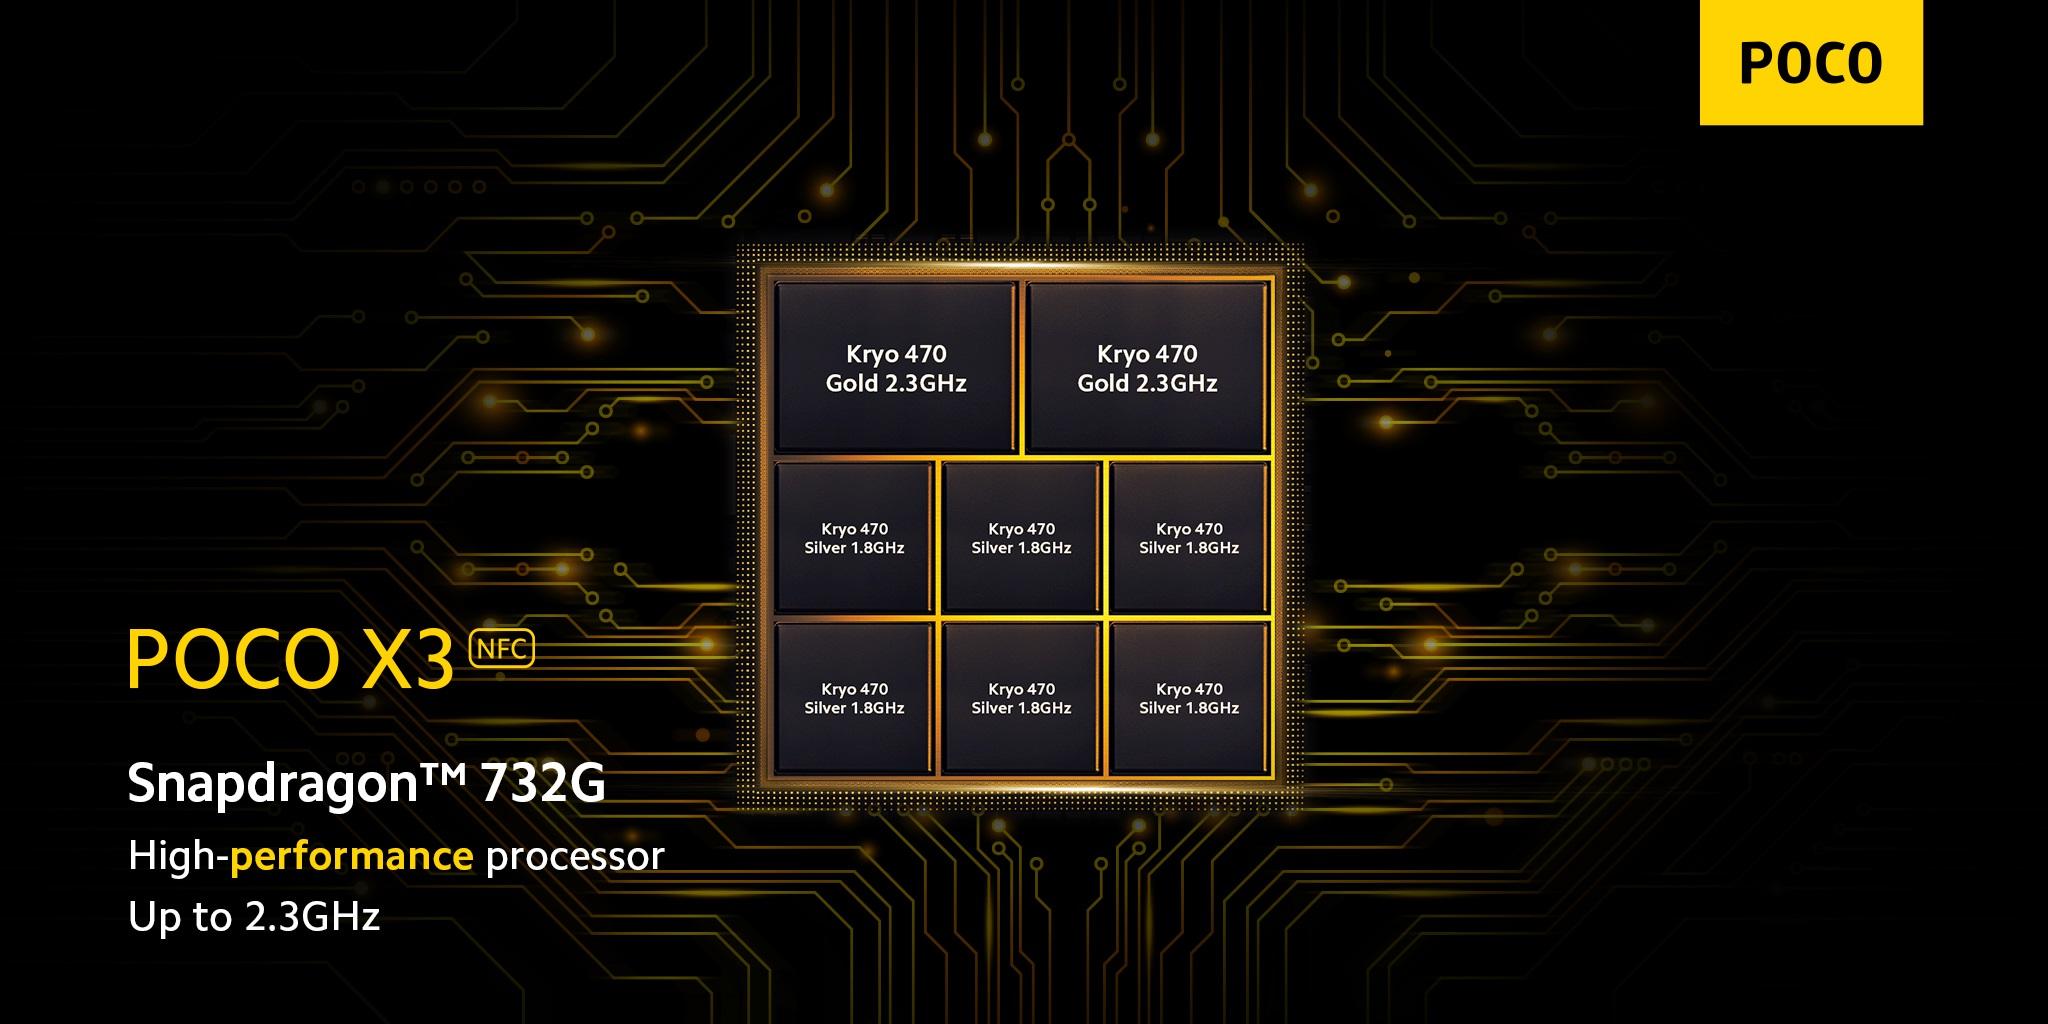 POCO X3 NFC Qualcomm Snapdragon 732G